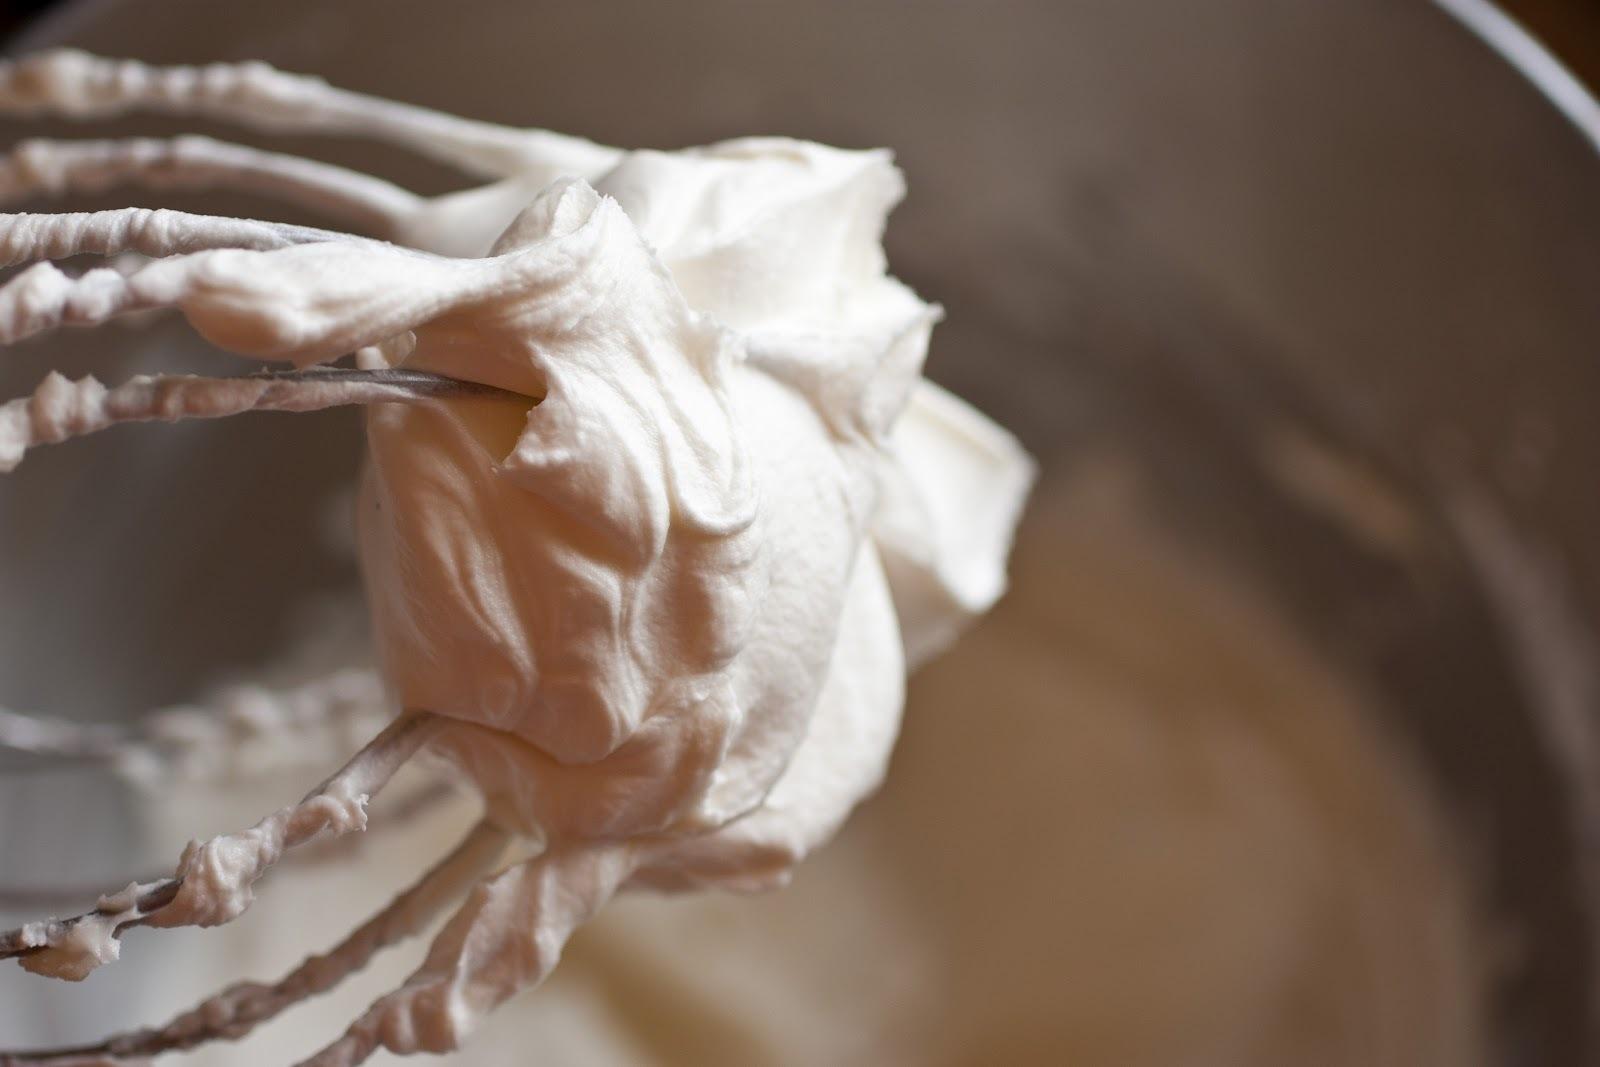 Cobertura Cremosa de Baunilha – Buttercream